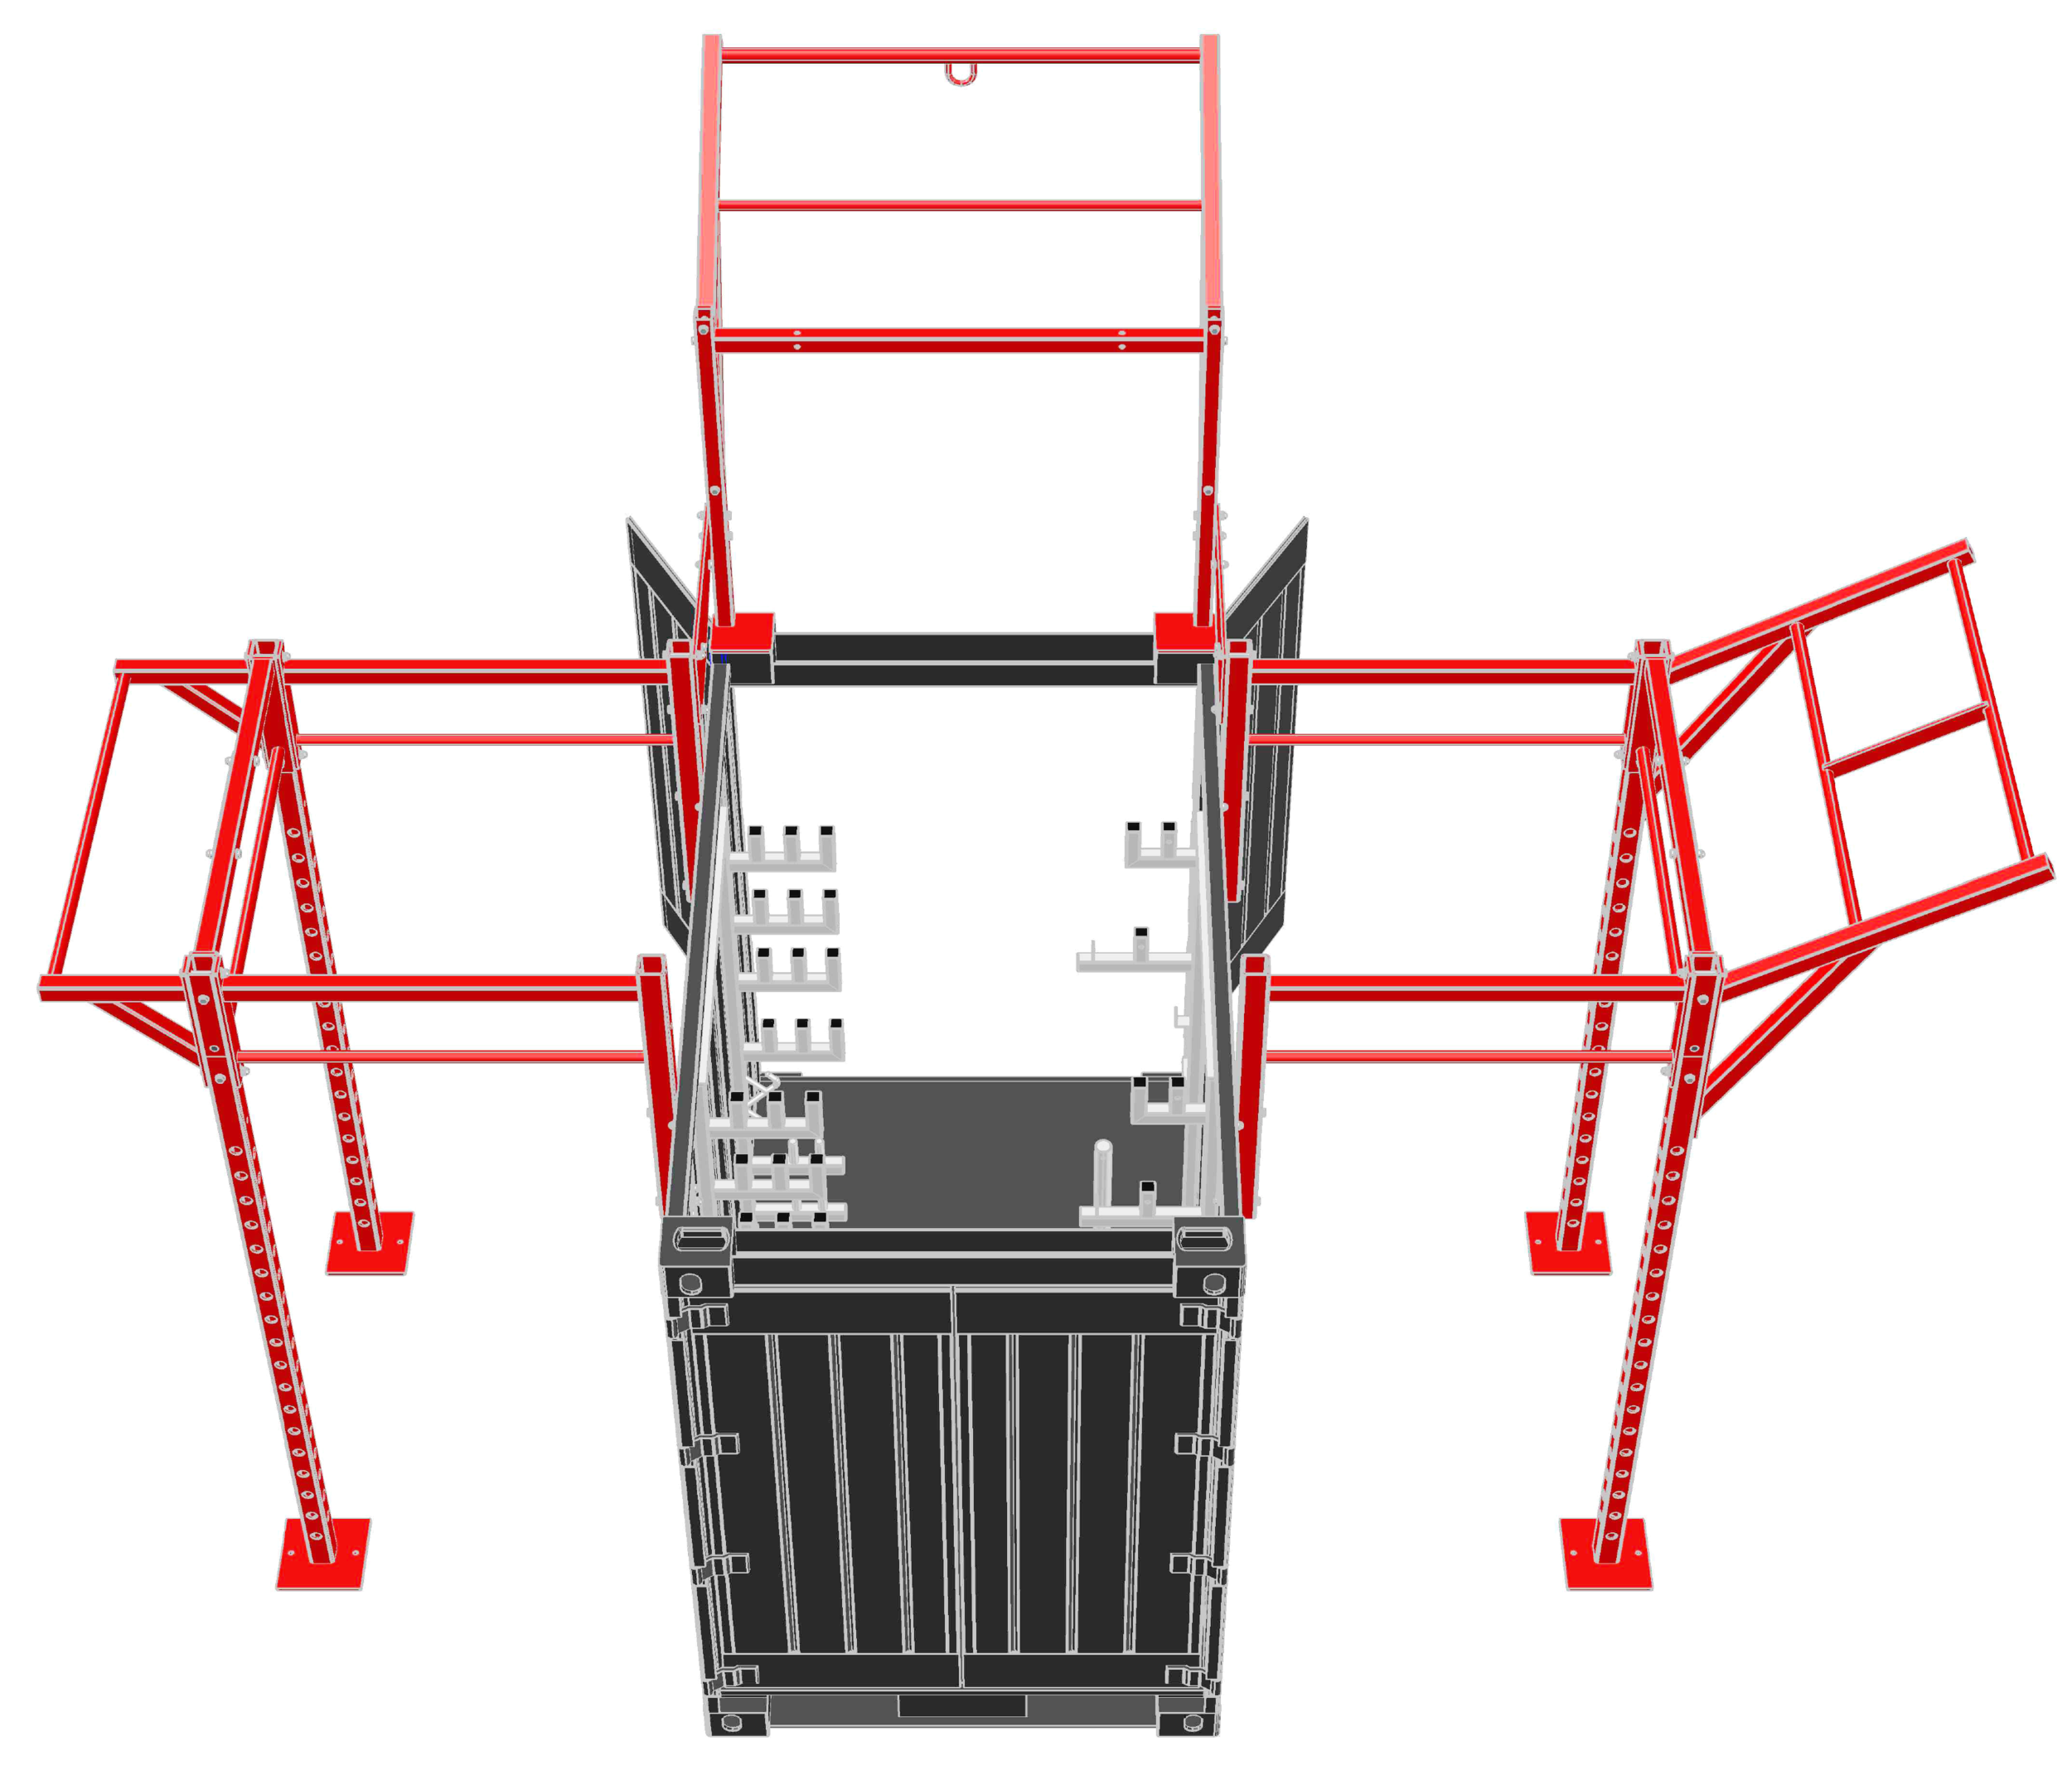 5' Deployable Locker Diagram